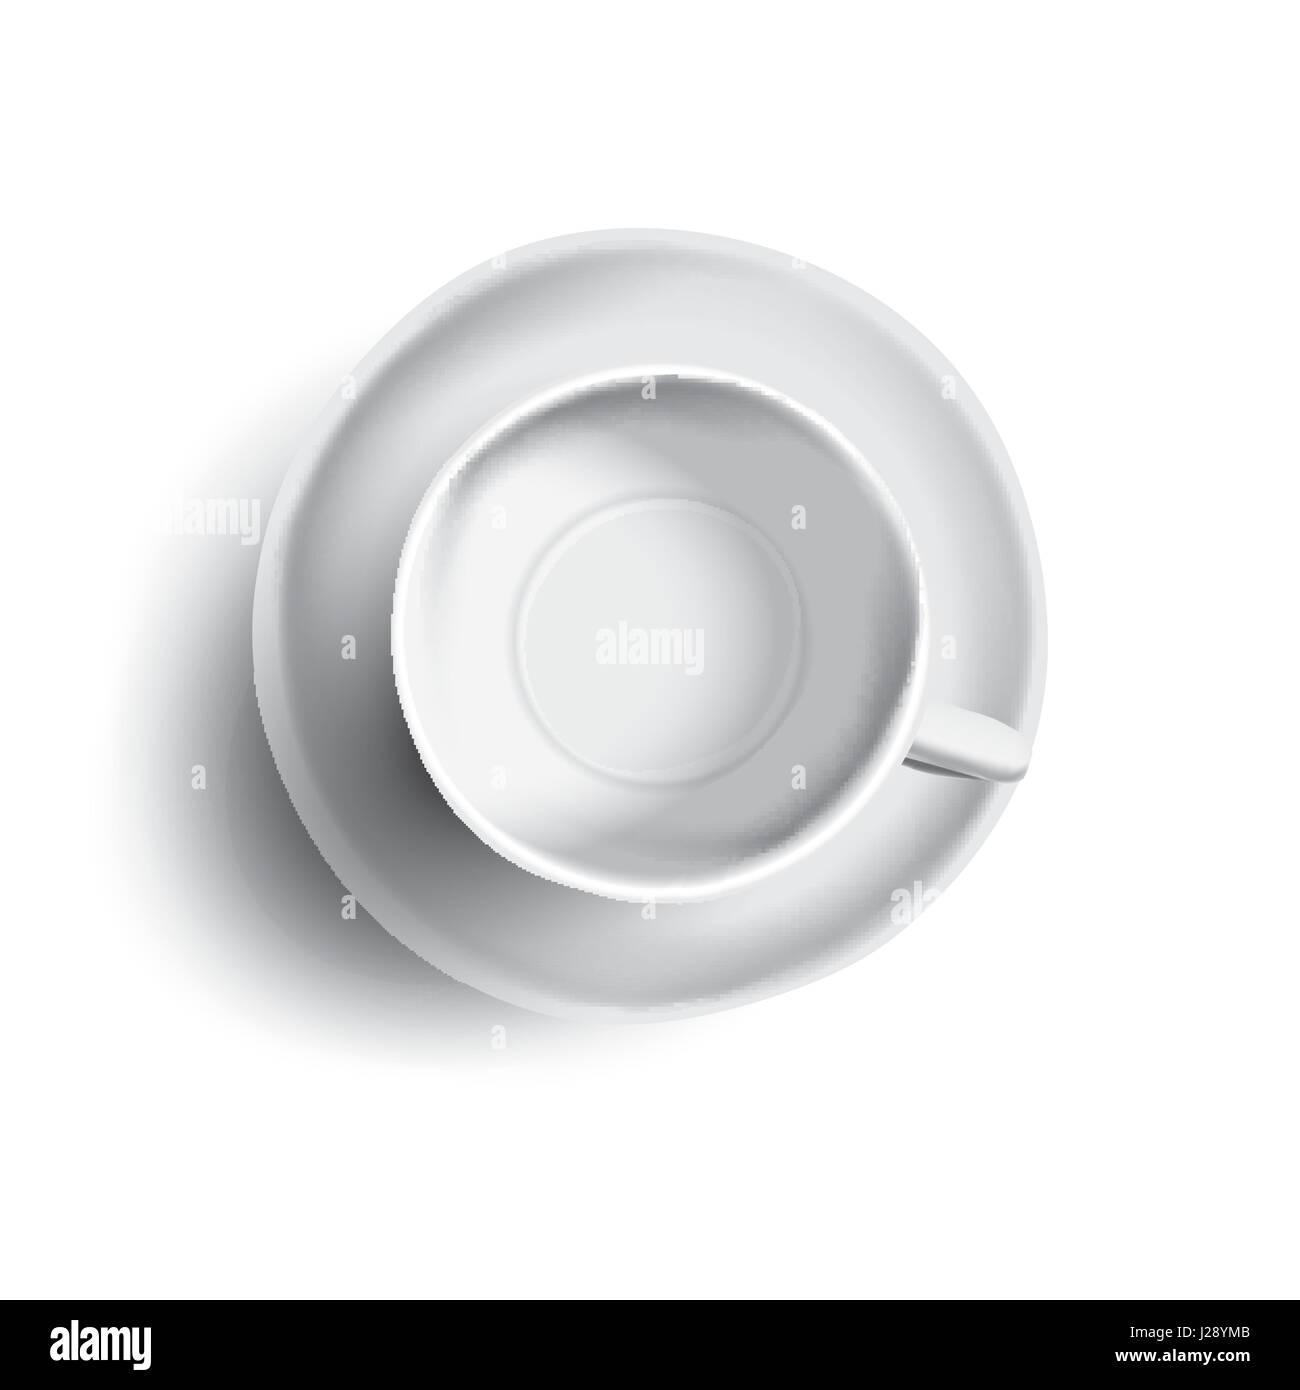 Empty Cup Top : Vector illustration of empty cup tea or coffee top